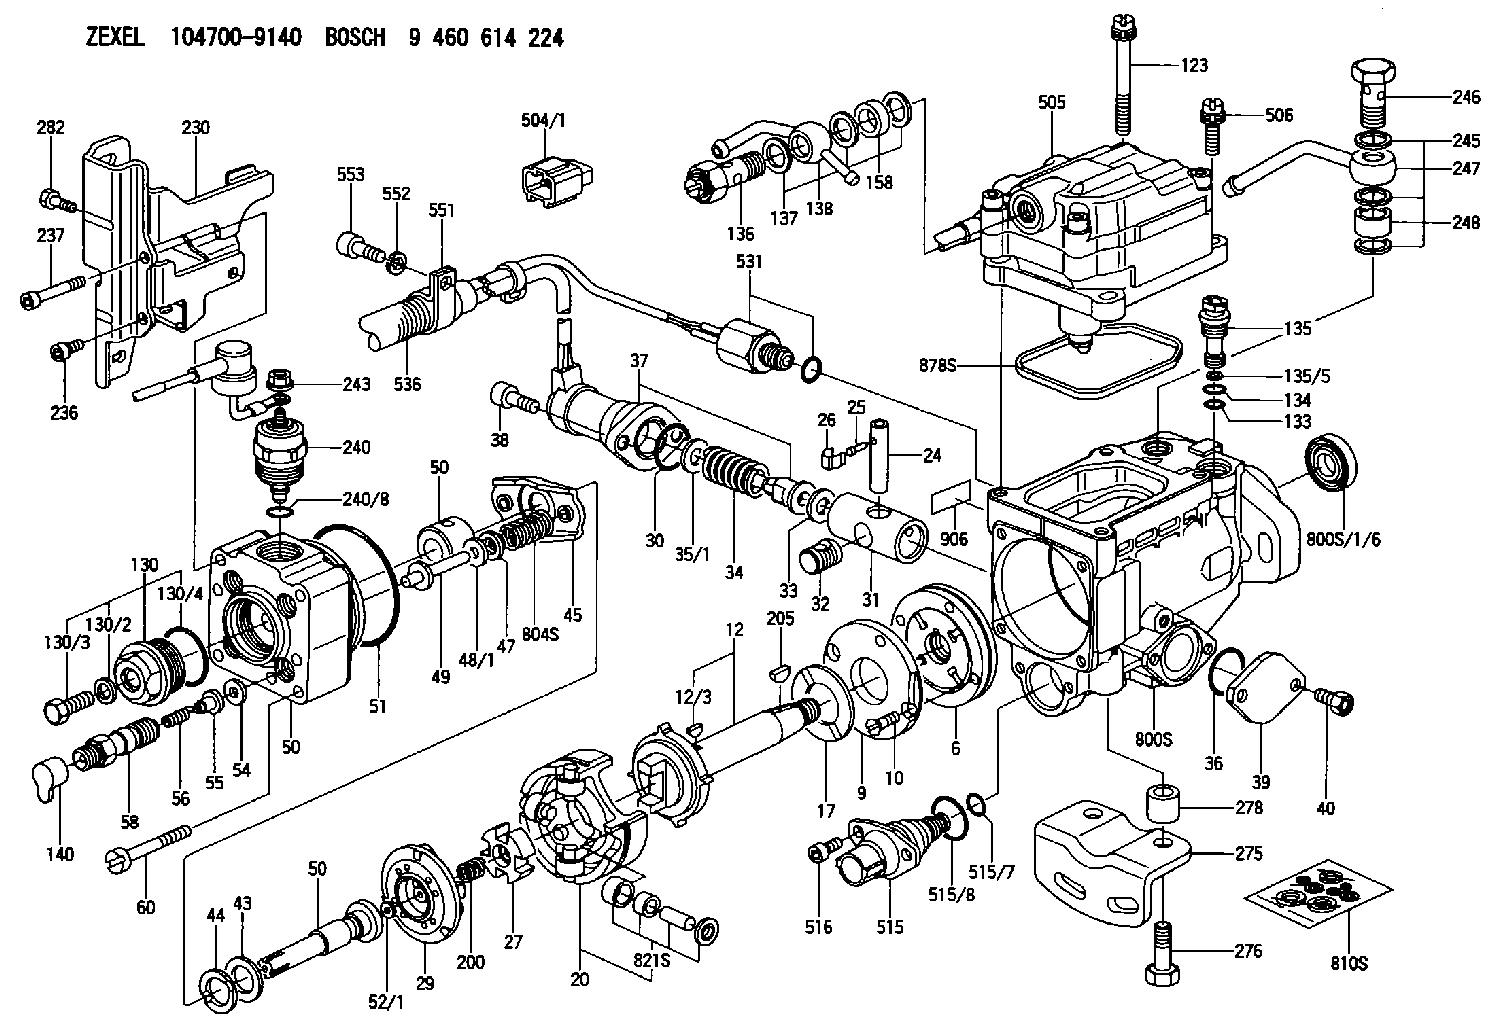 nissan engine zd